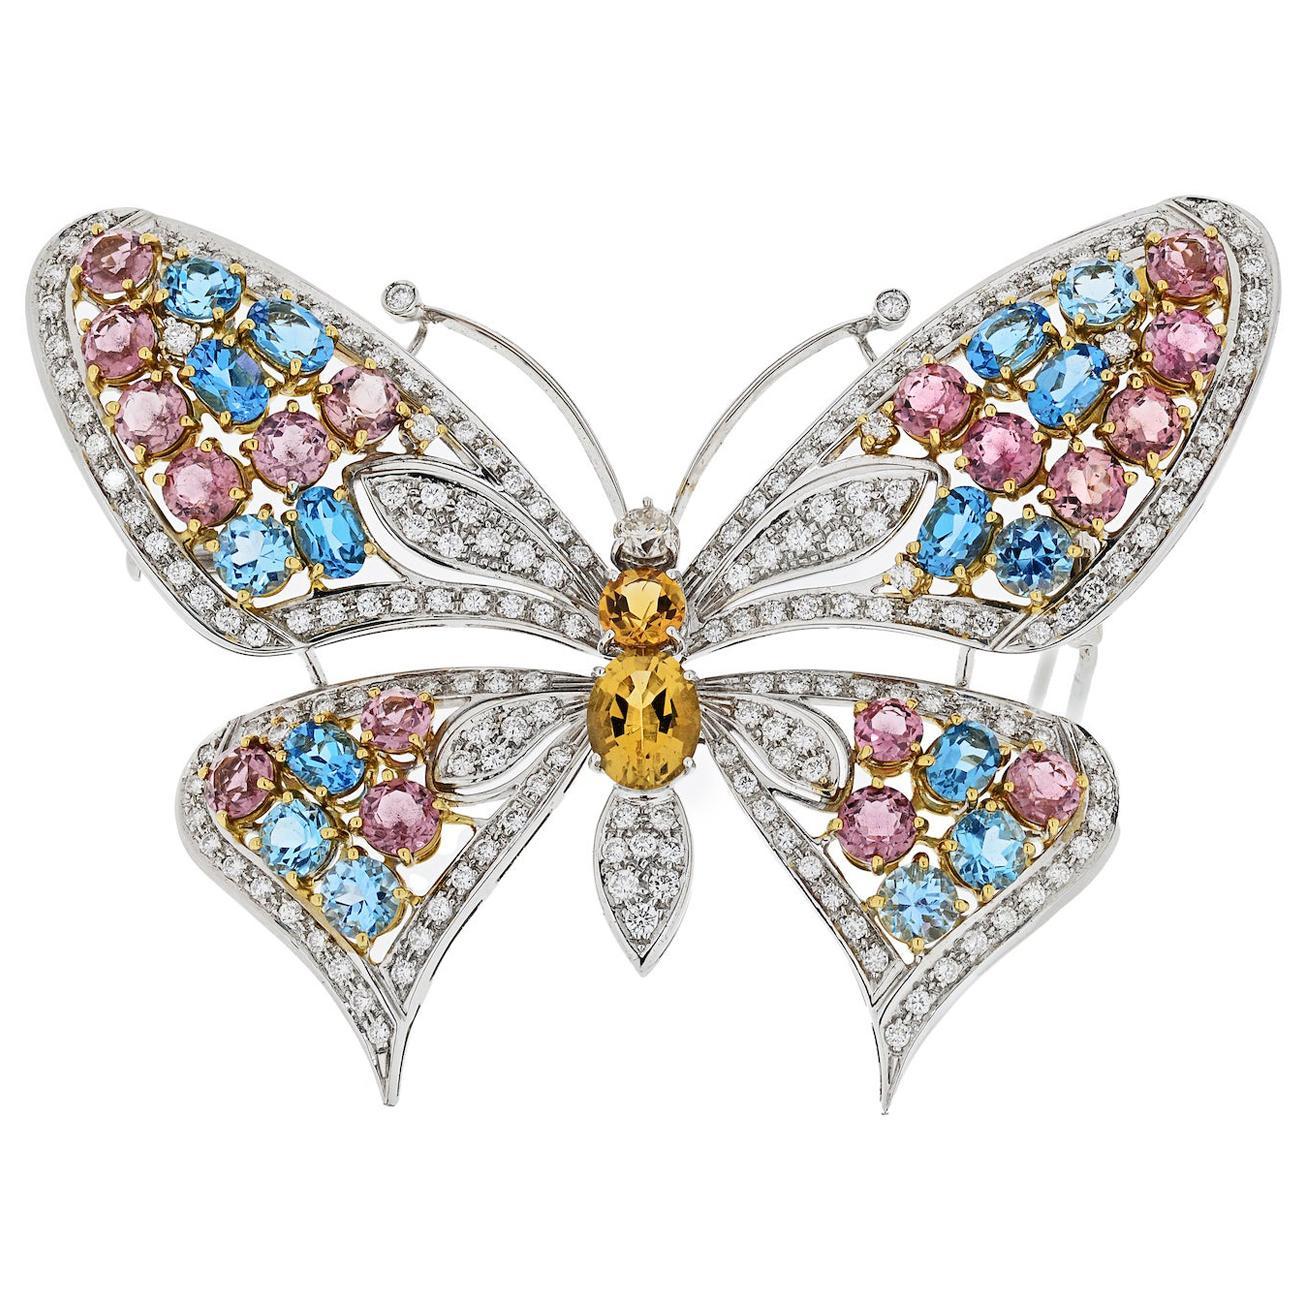 18 Karat White Gold Gemstone and Diamond Butterfly Pin Brooch